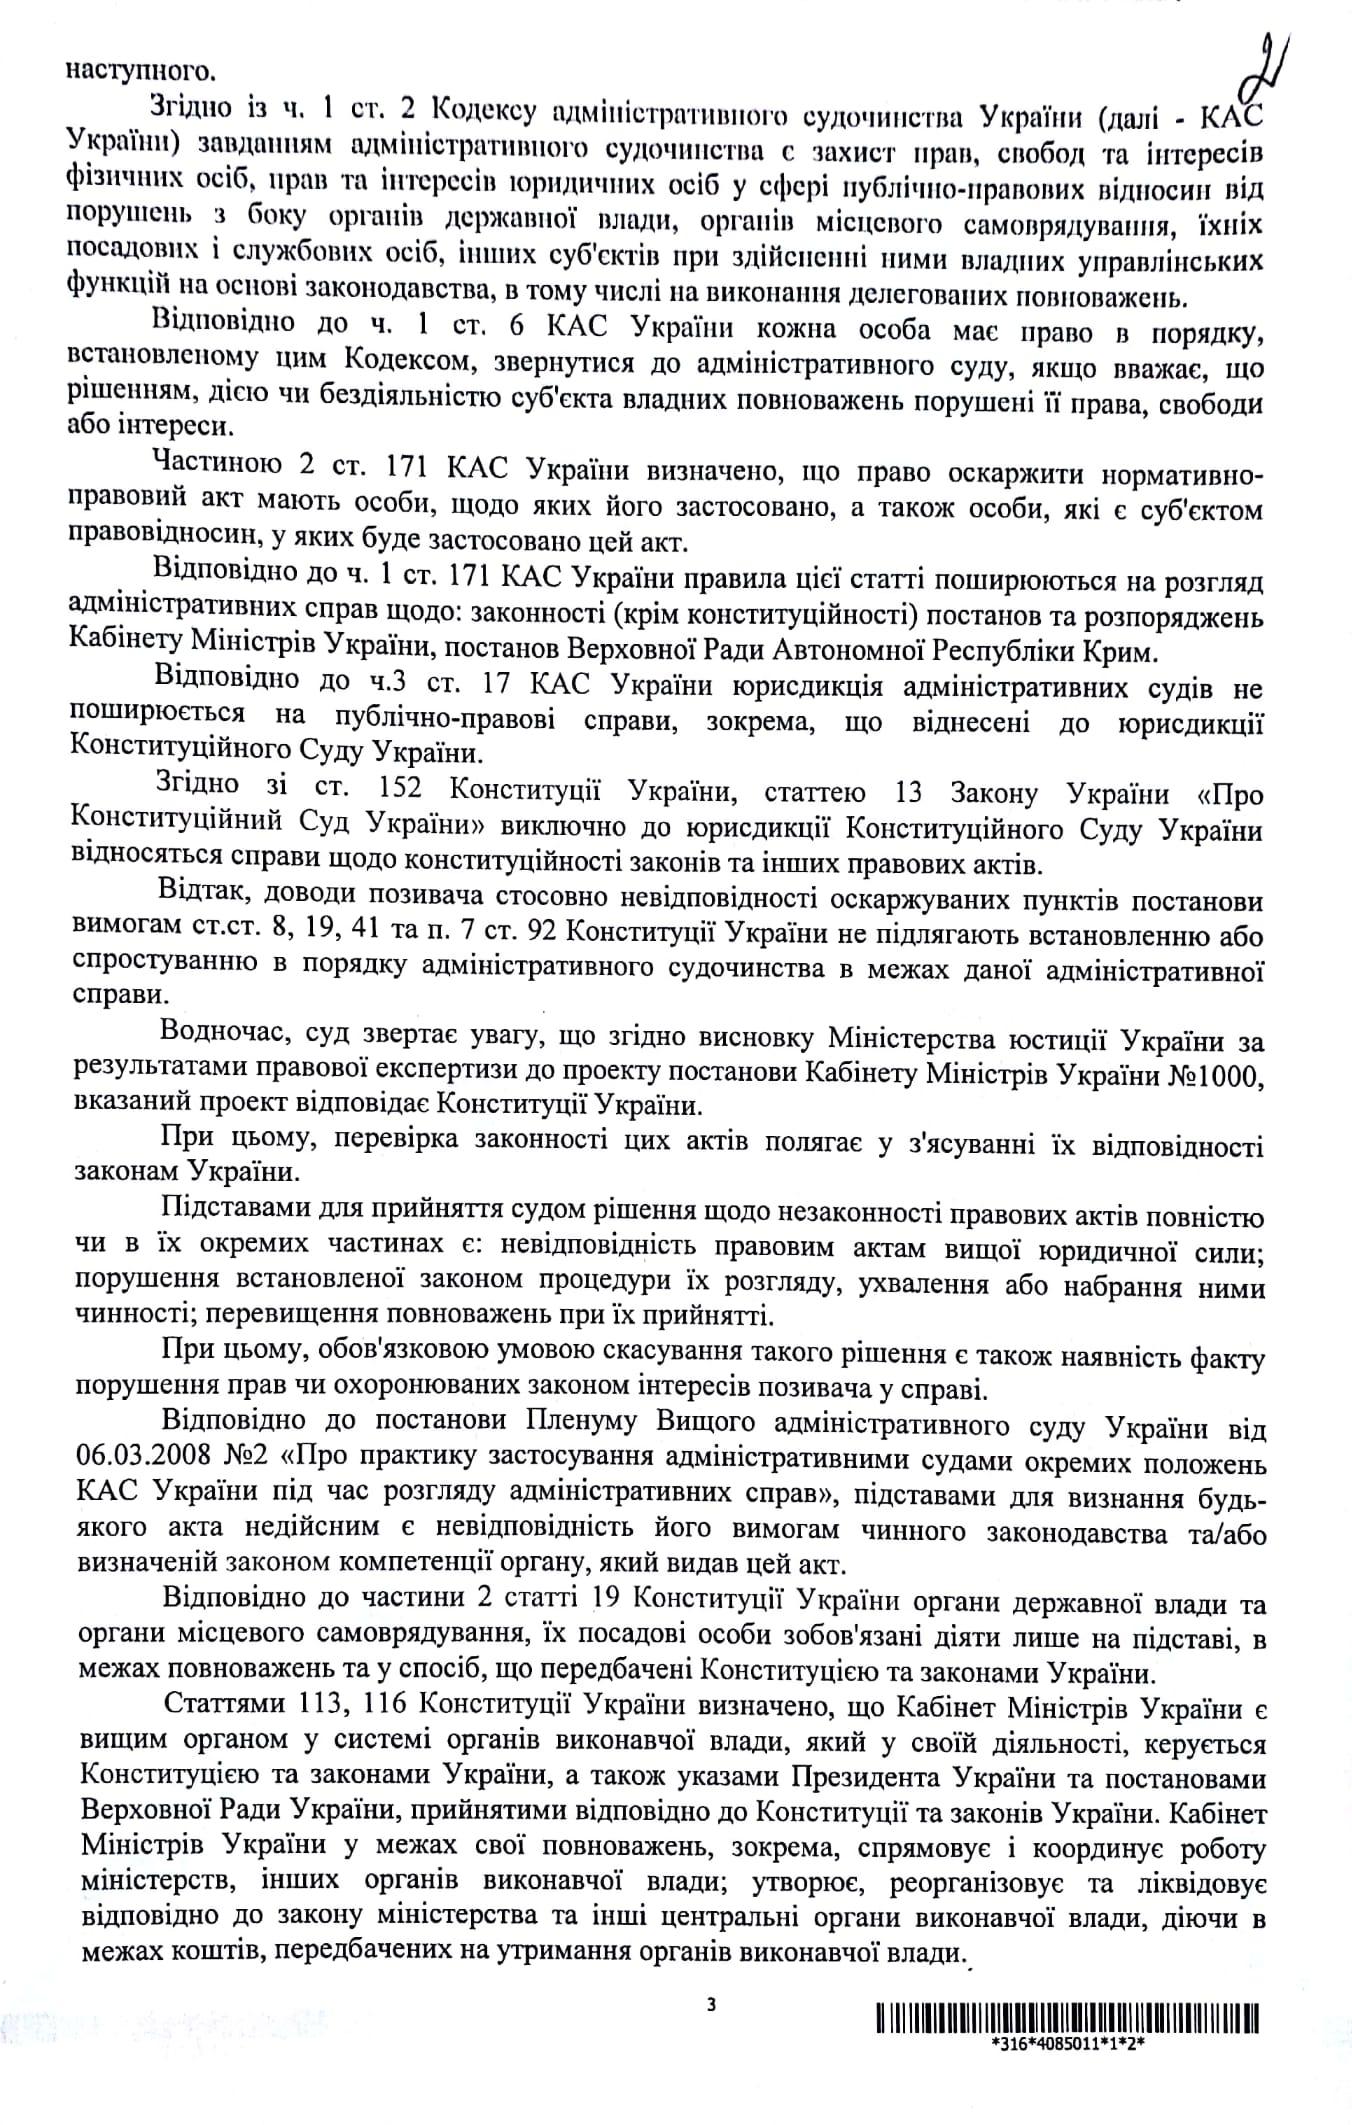 Постанова КМУ1000_3